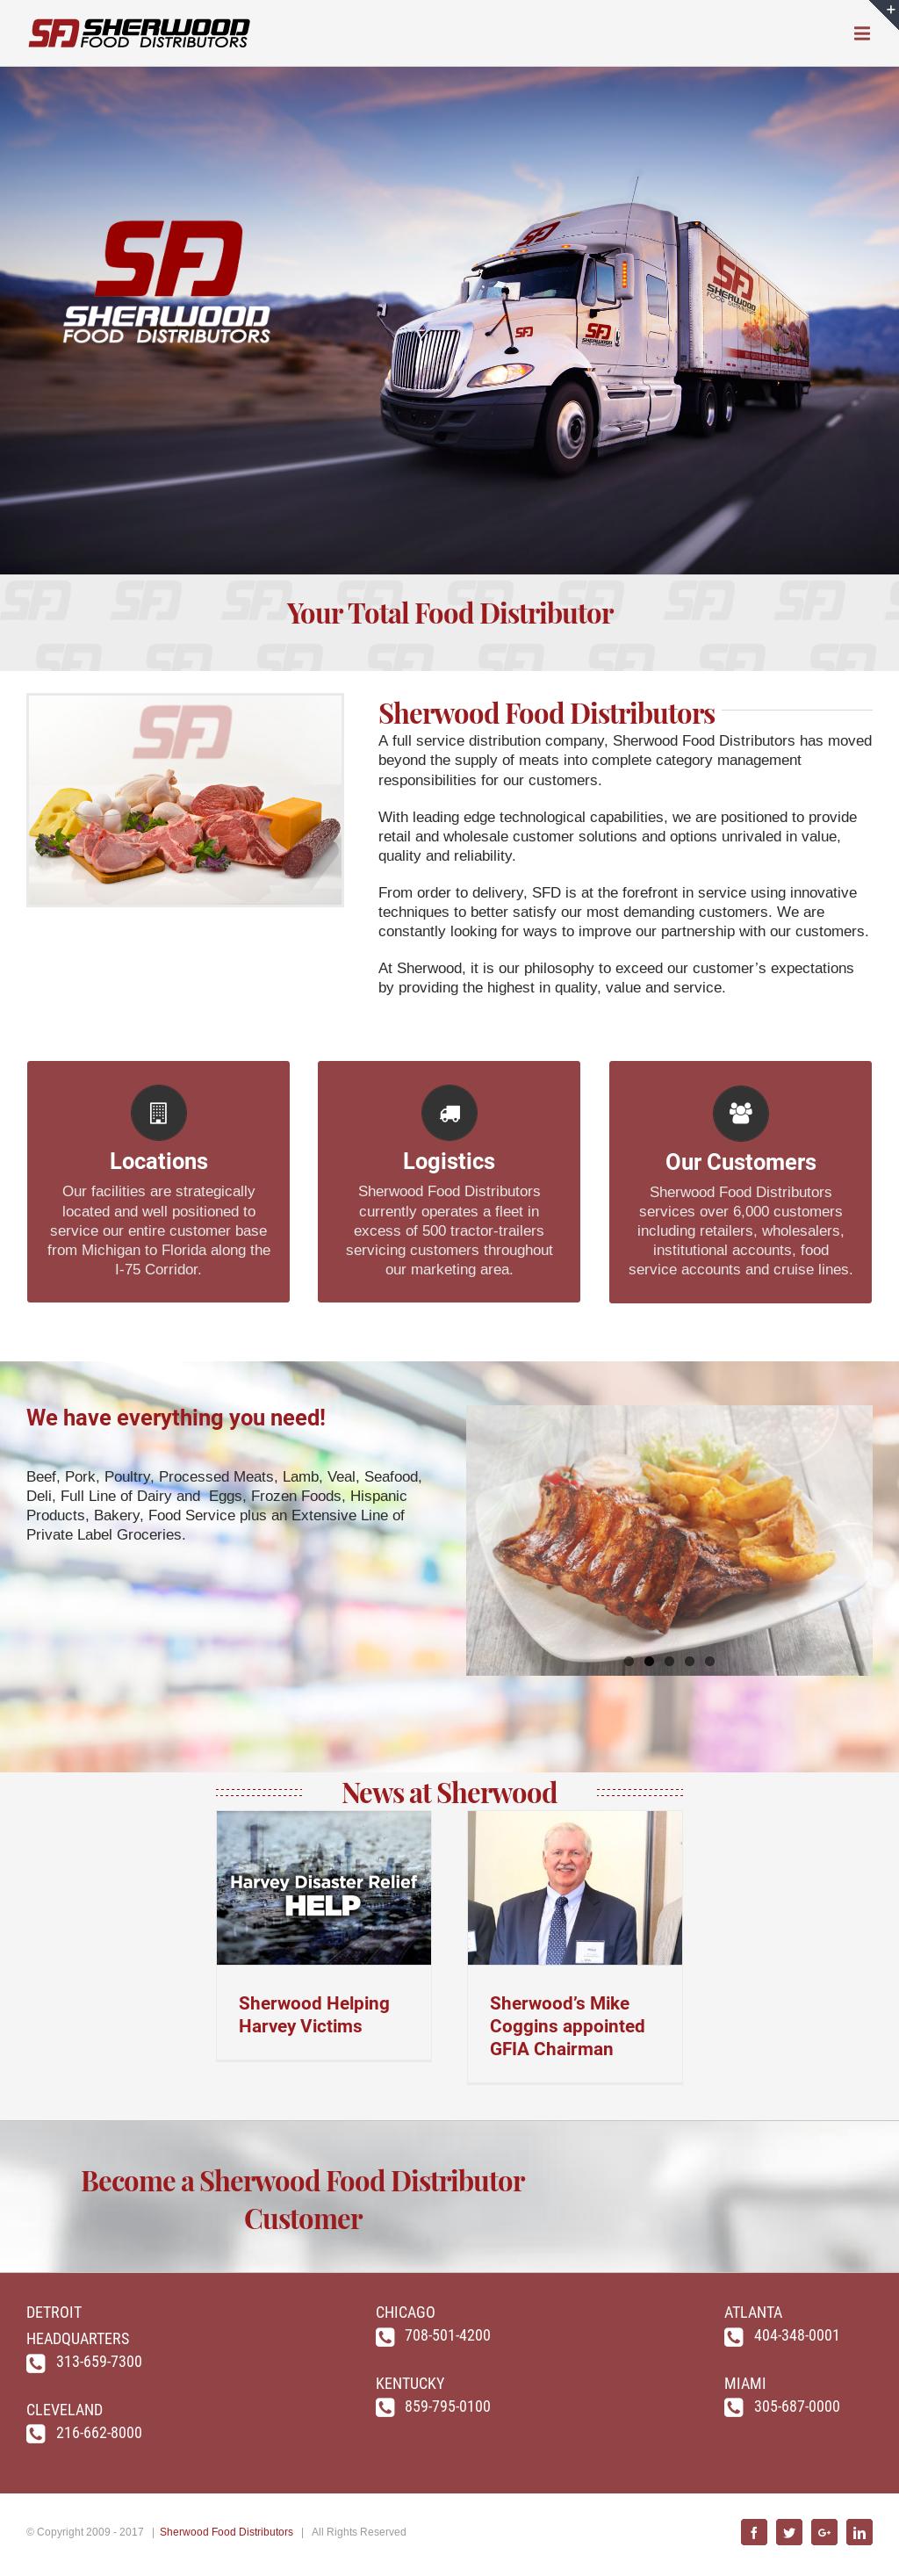 Sherwood Food Distributors Competitors, Revenue and